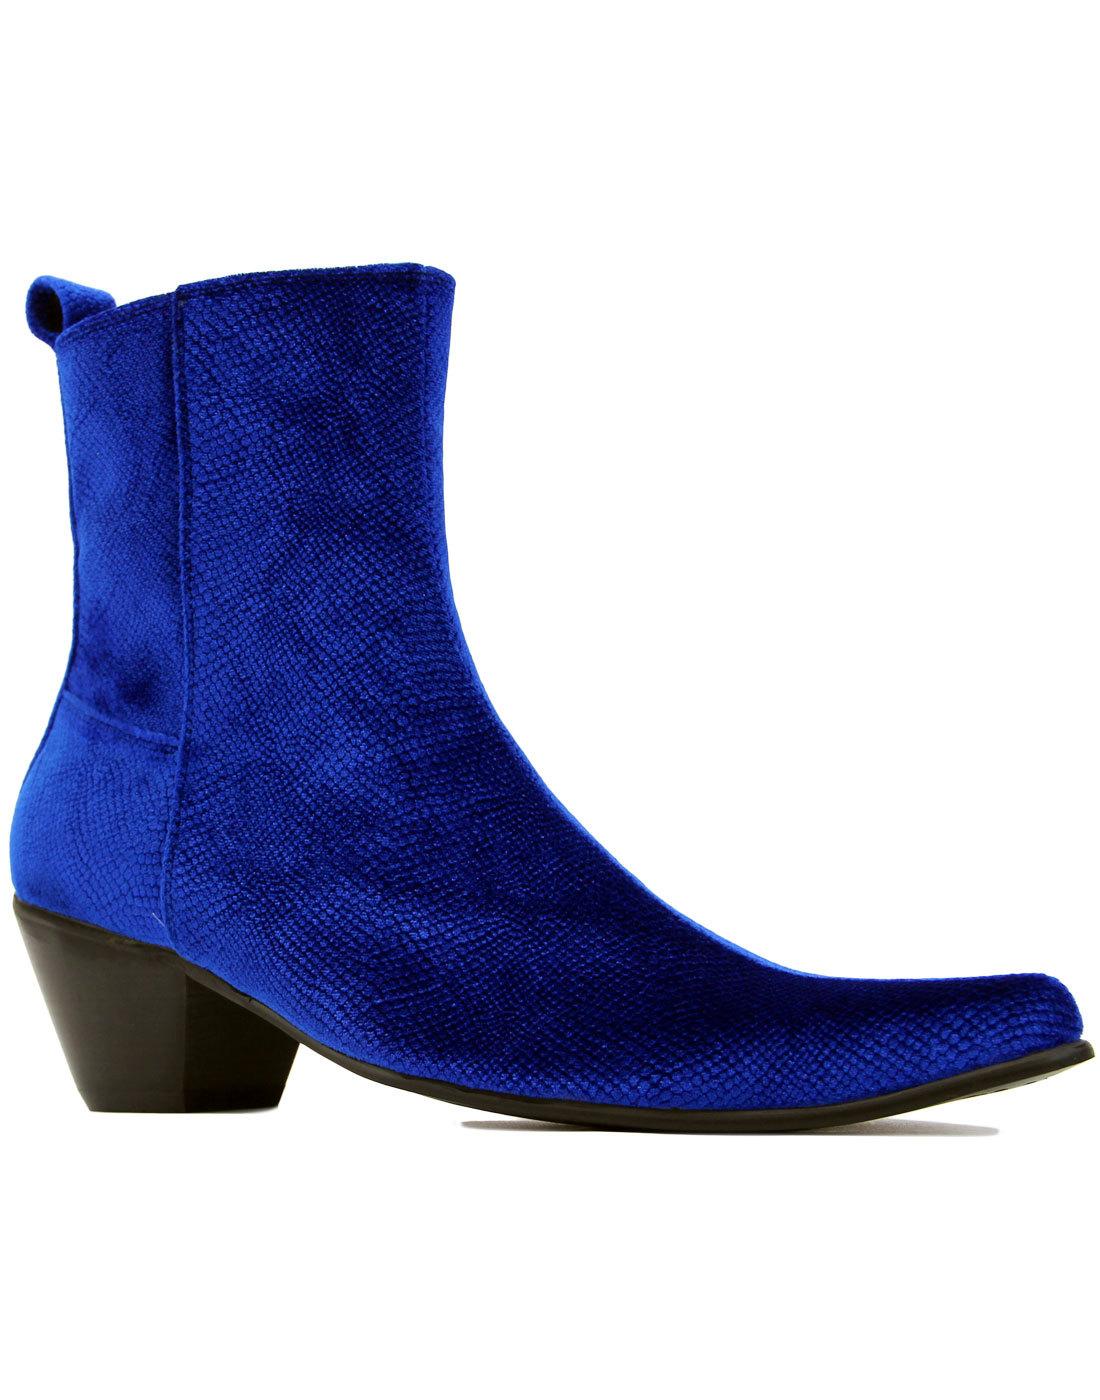 madcap england velvet casbah chelsea boots royal